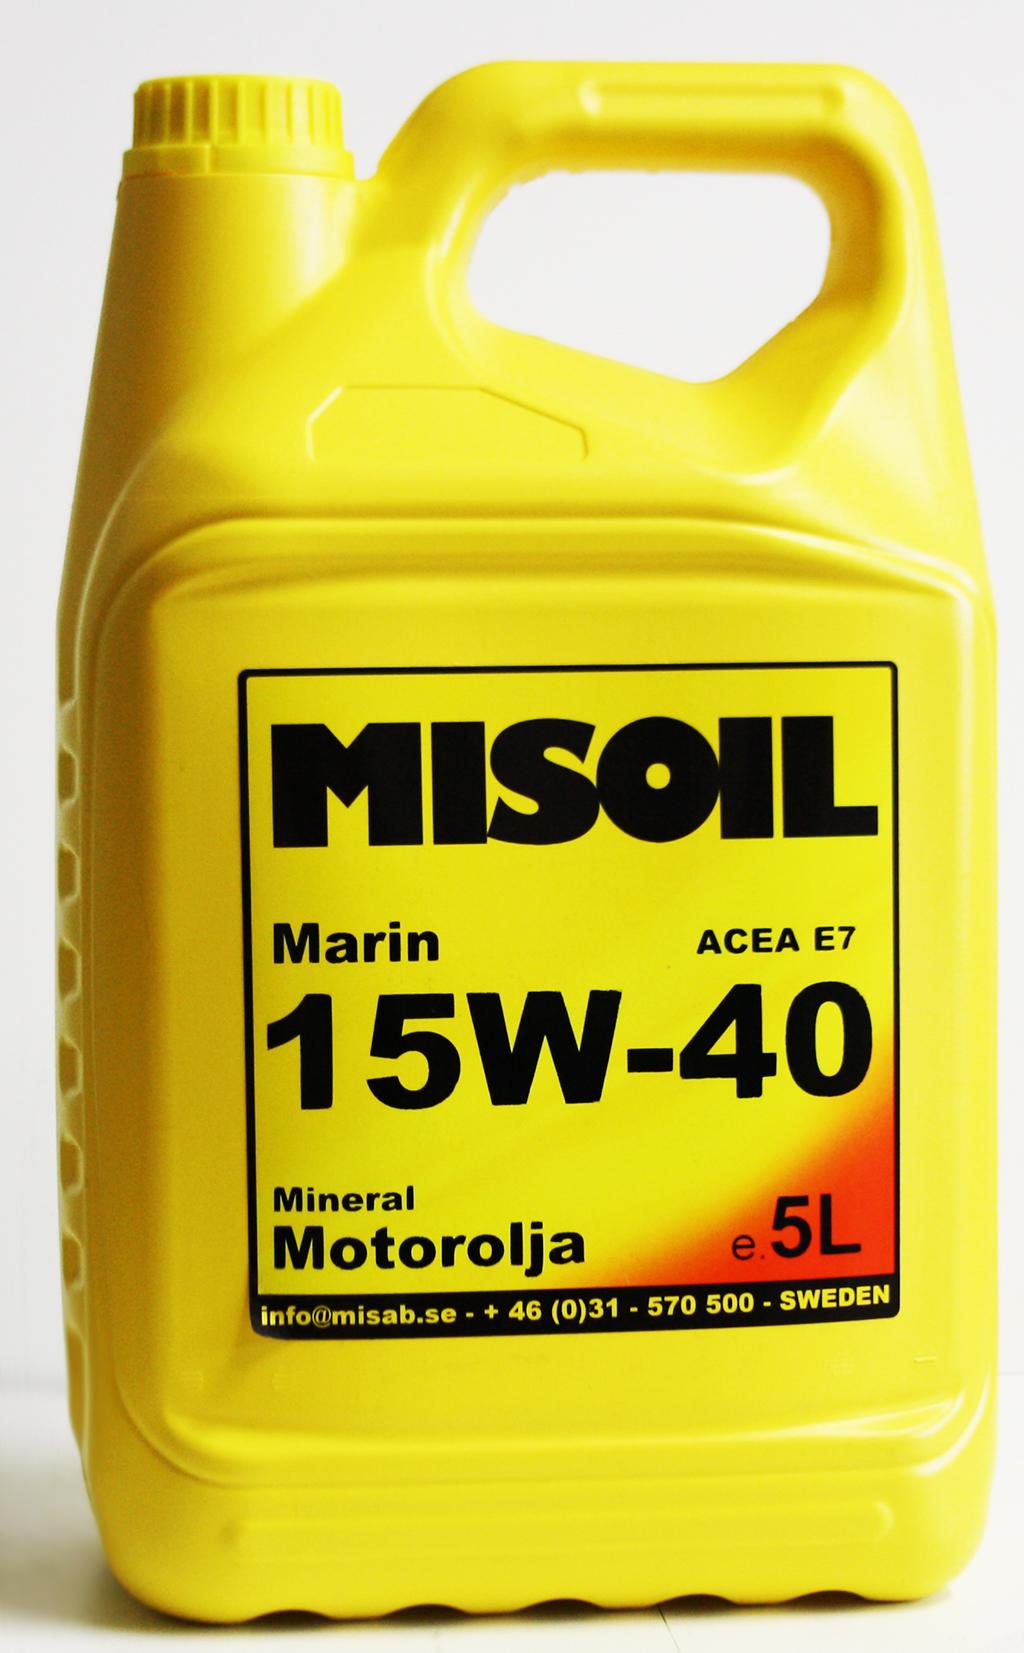 MISOIL MARIN 15W-40